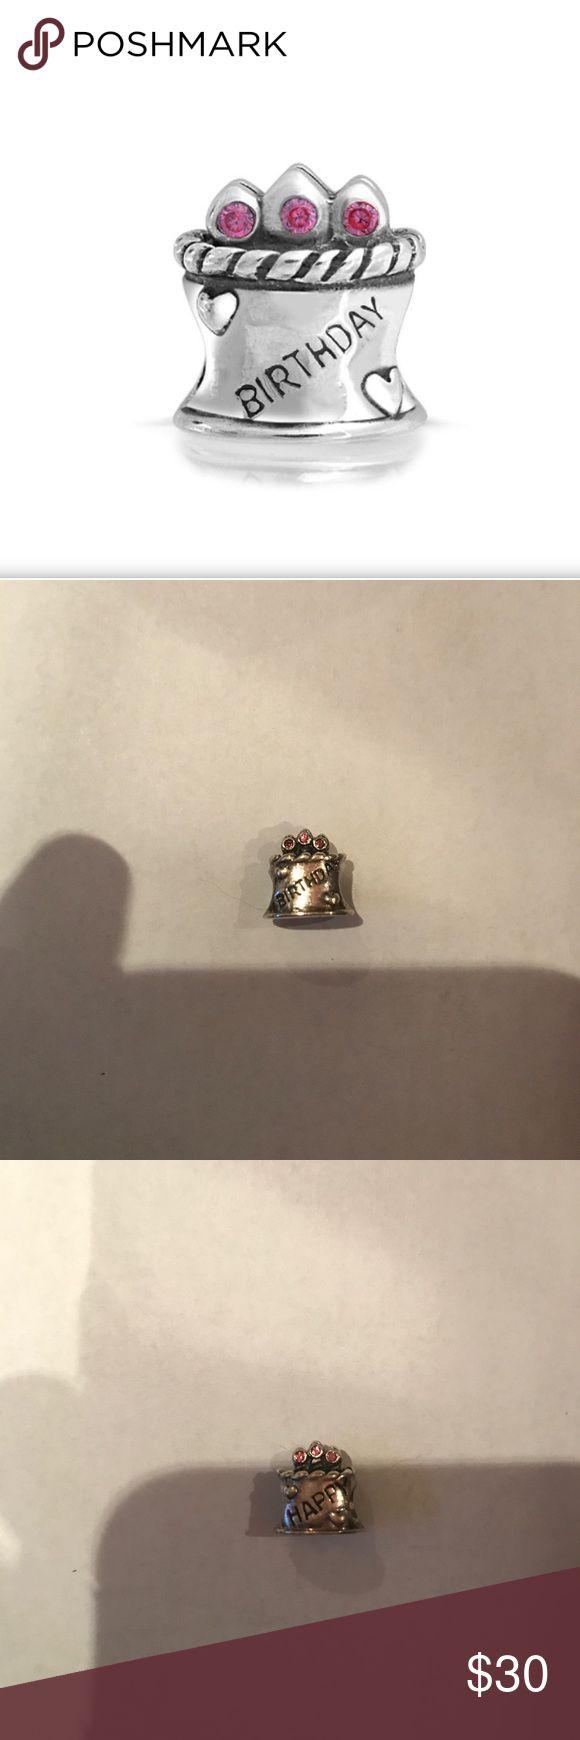 Pandora birthday cake charm Jewels on top are pink Pandora Jewelry Bracelets